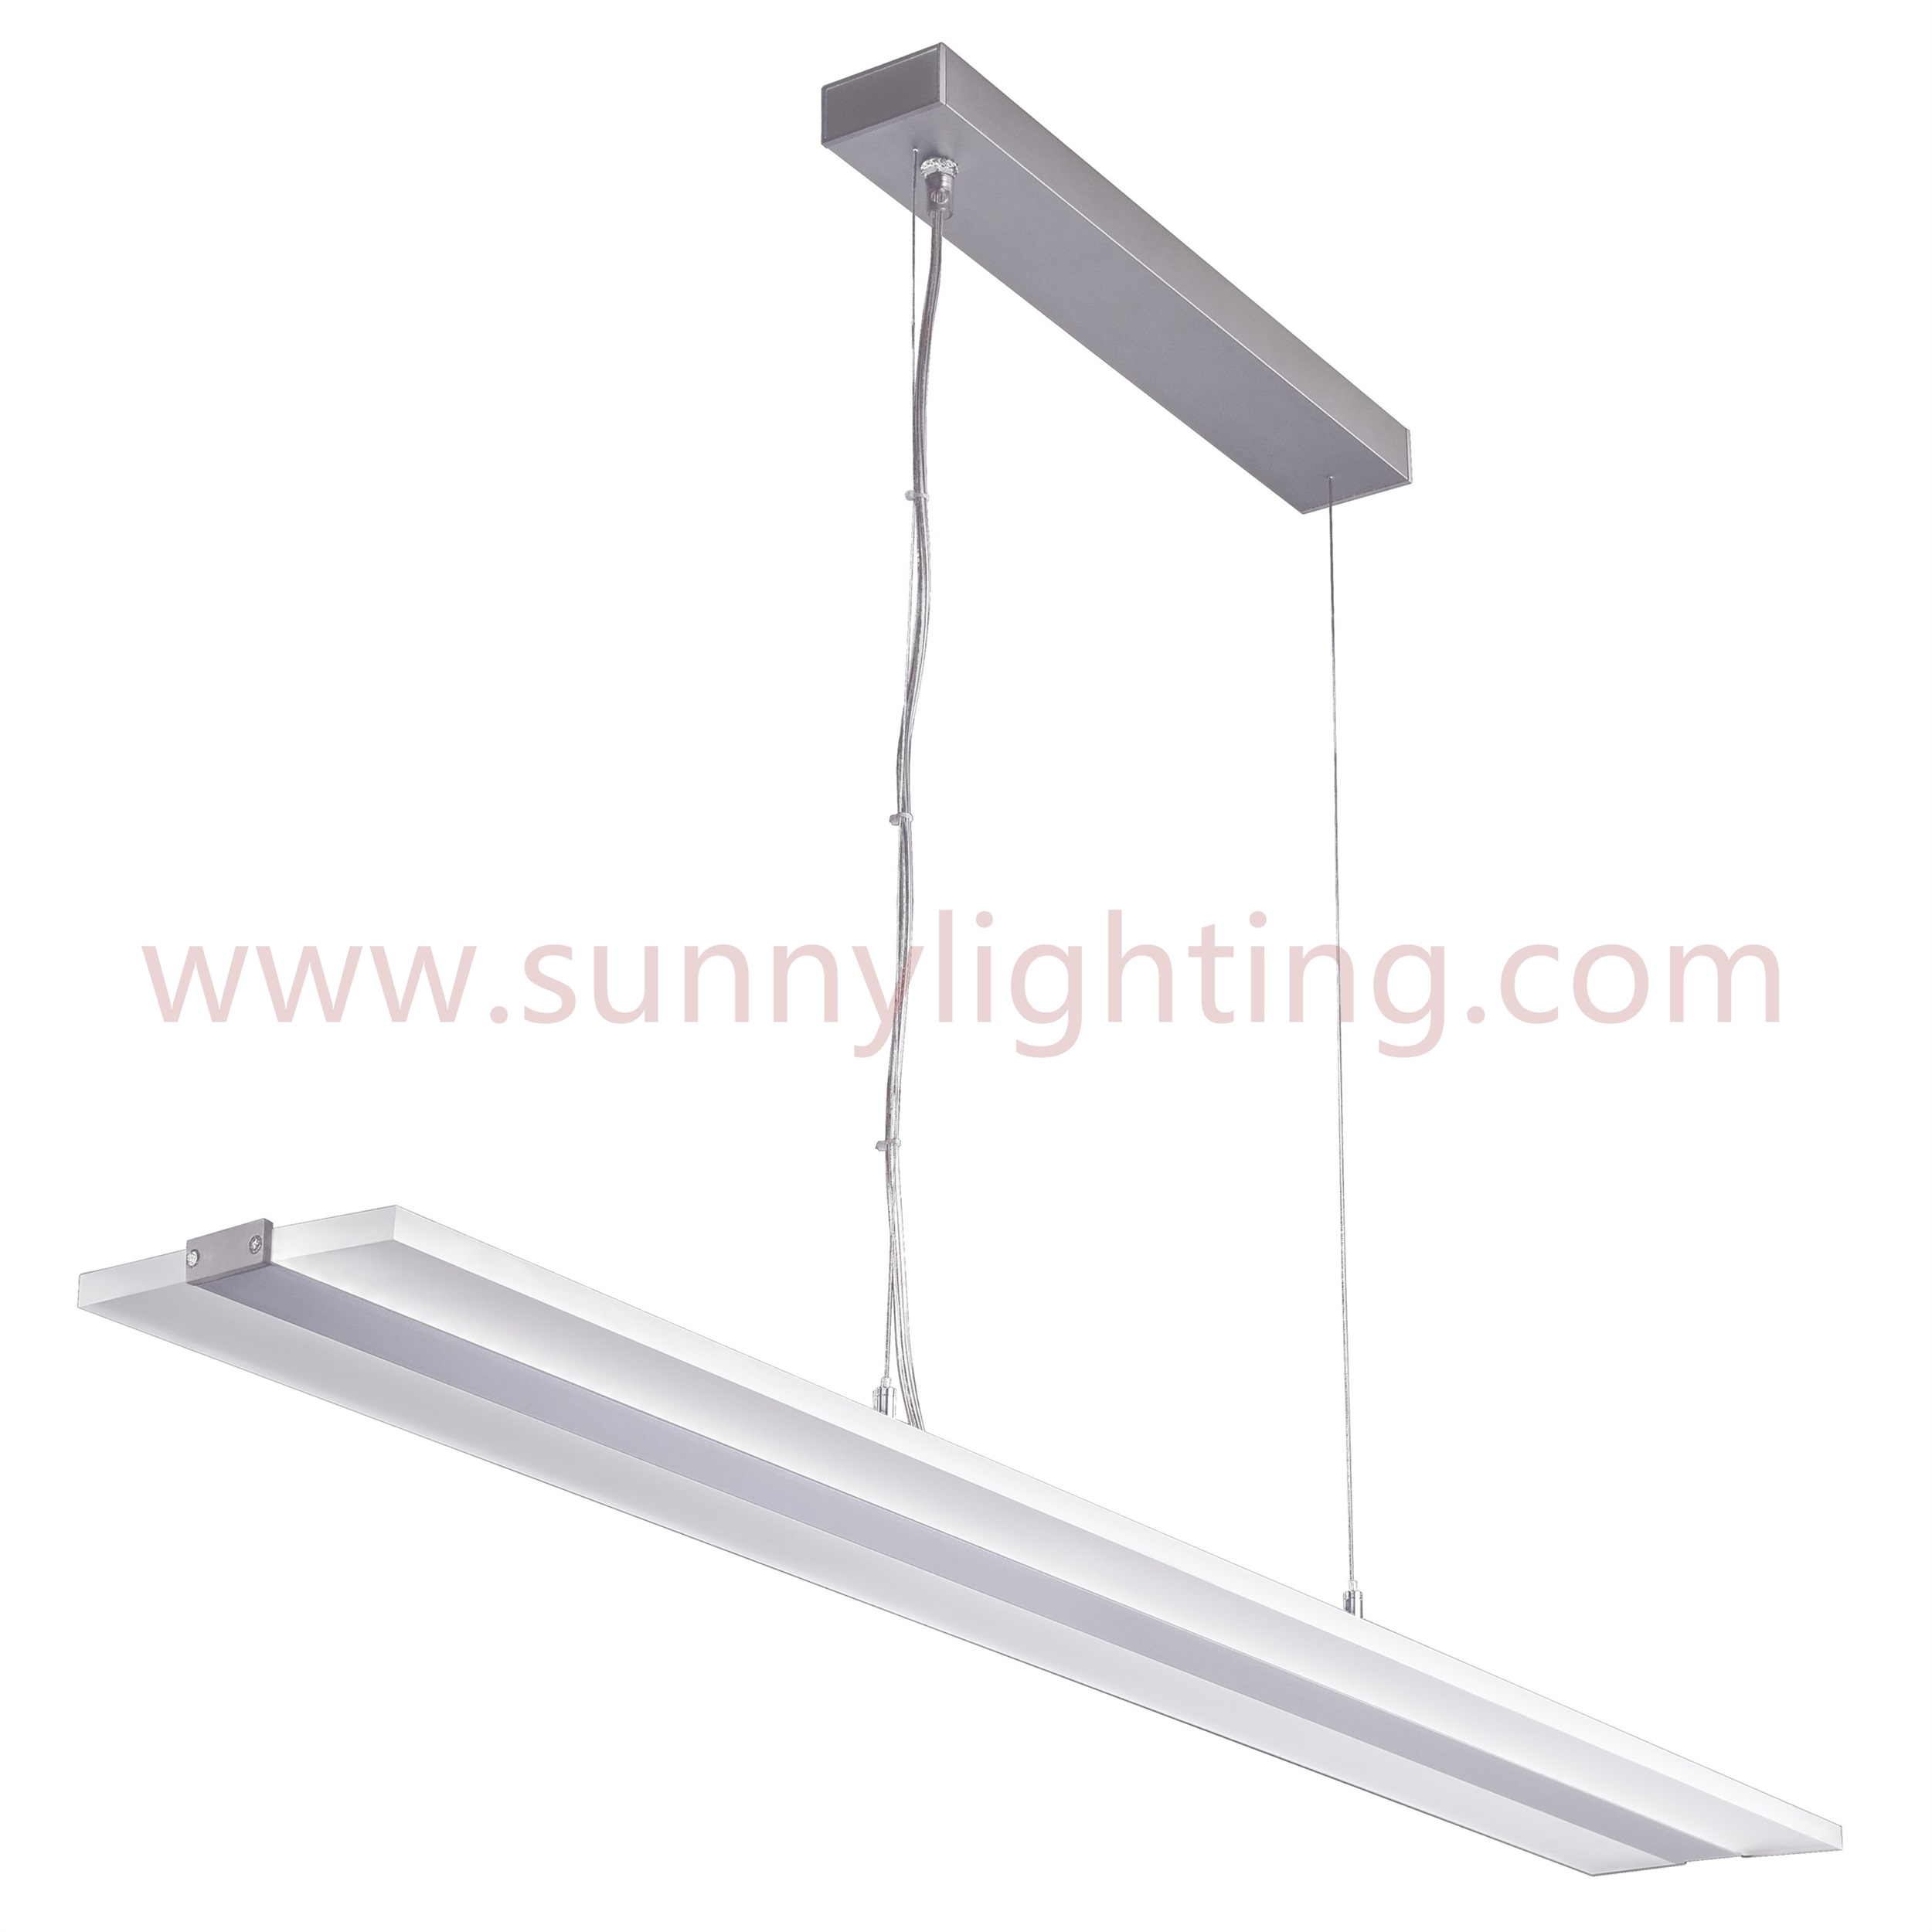 LED Linear Light 14.4W/21.6/28.8W/36W LED-047